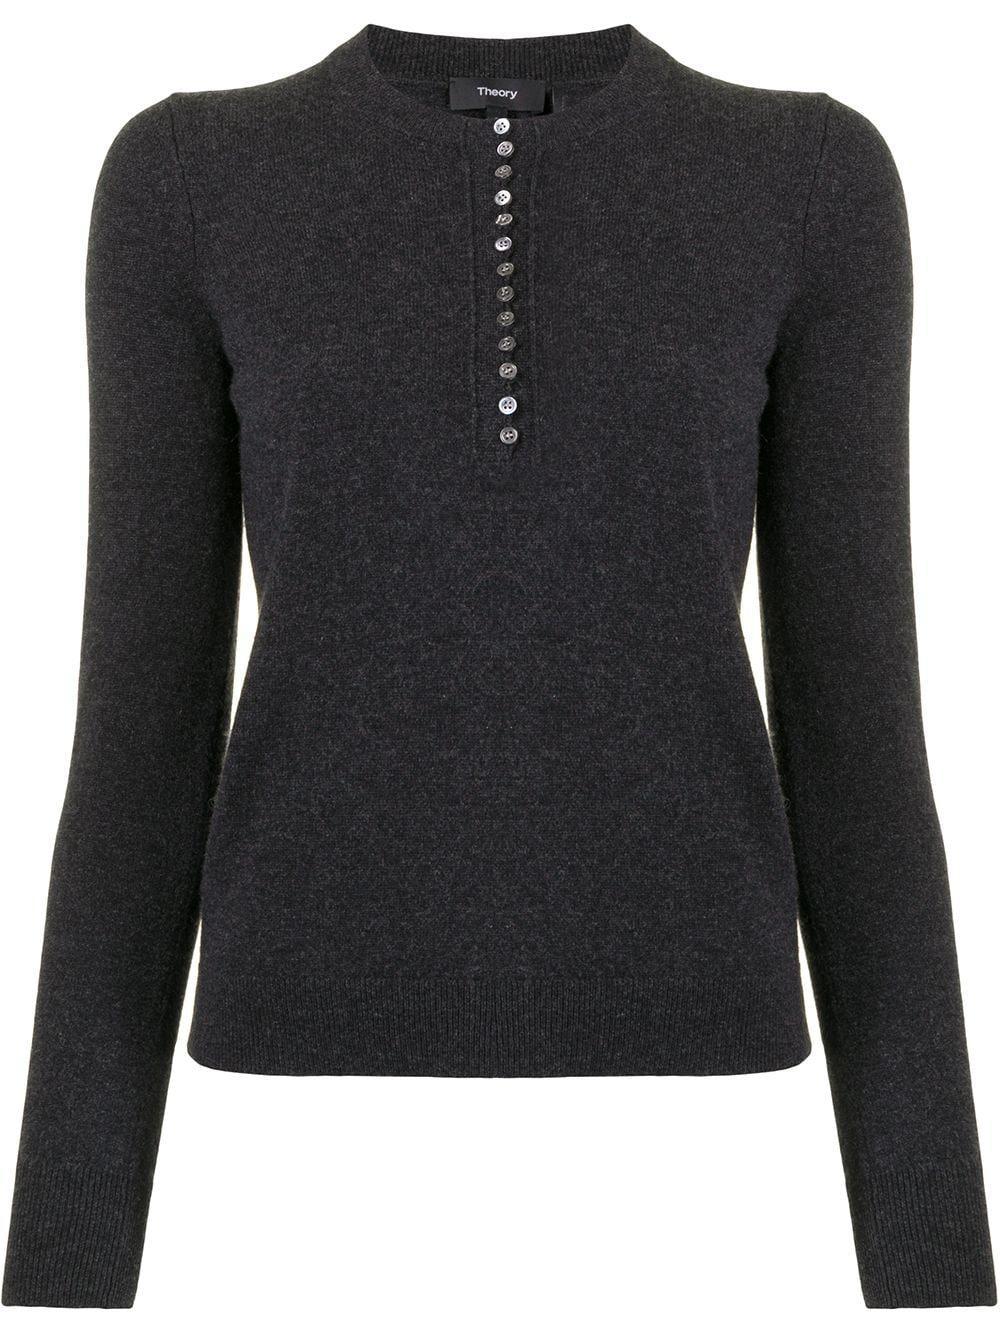 Cashmere Henley Sweater Item # J1018703-R21